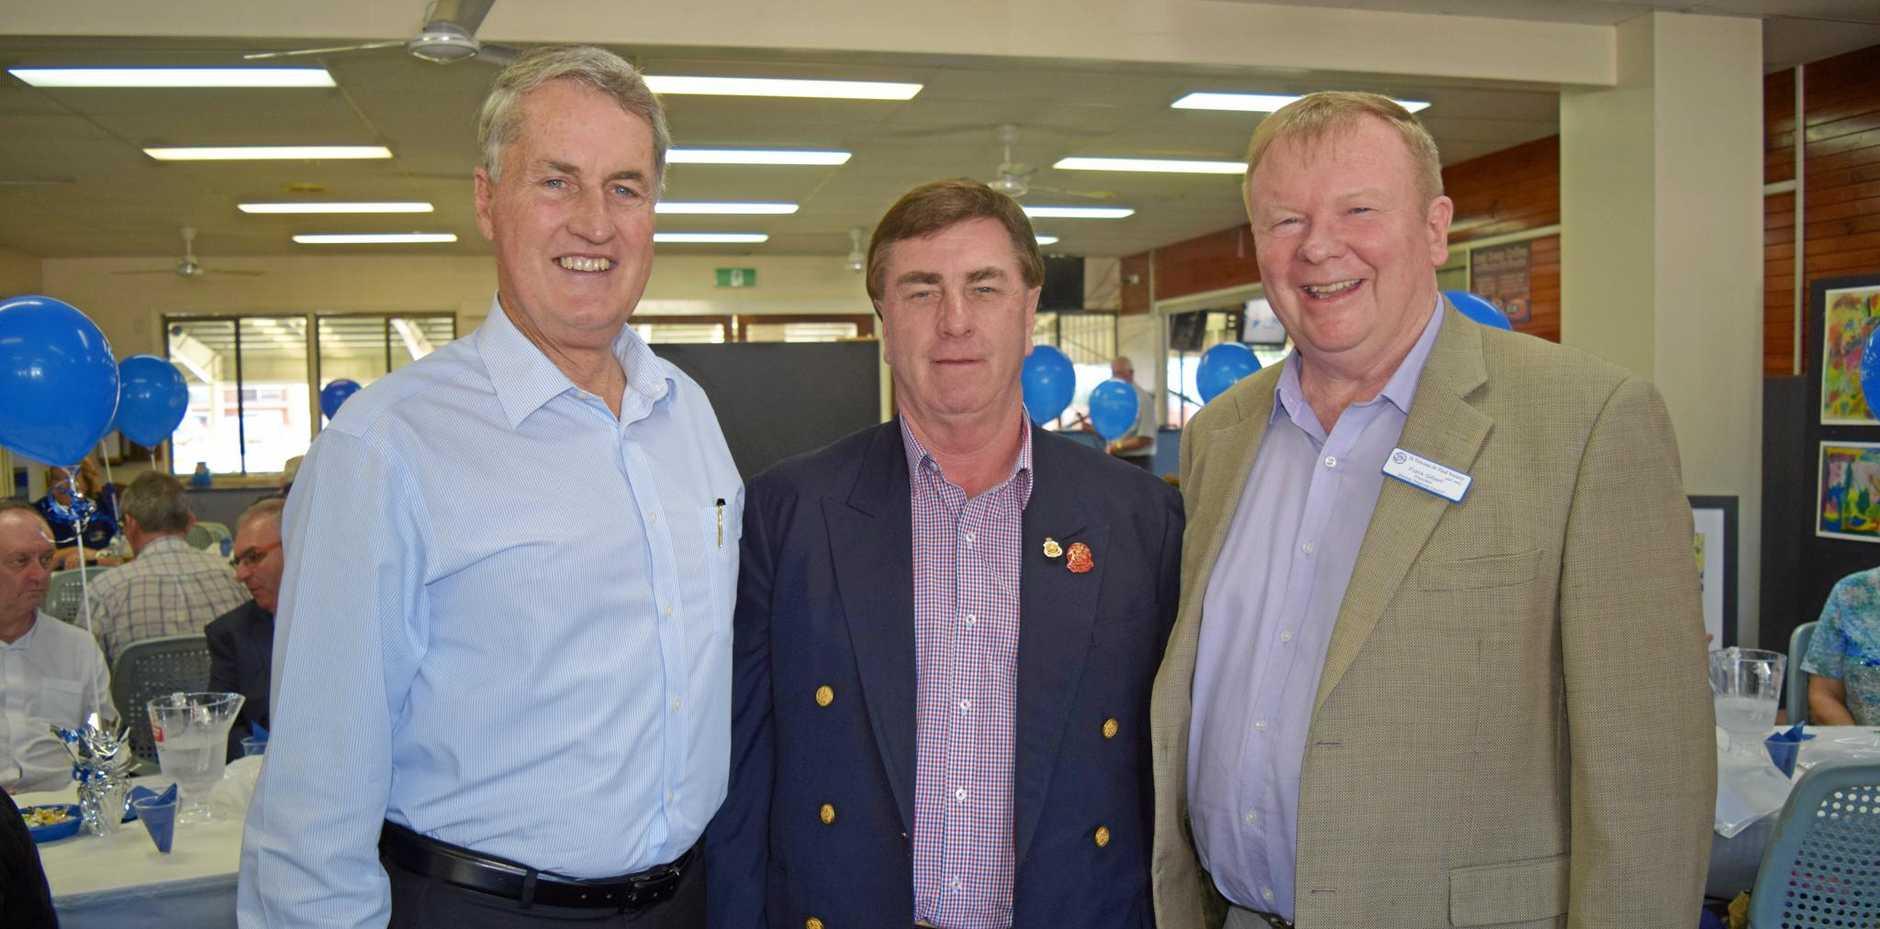 GIVING BACK: Mayor Greg Williamson,  former tenant Bill Black and Frank Gilbert at the  Vinnies 10 year anniversary.